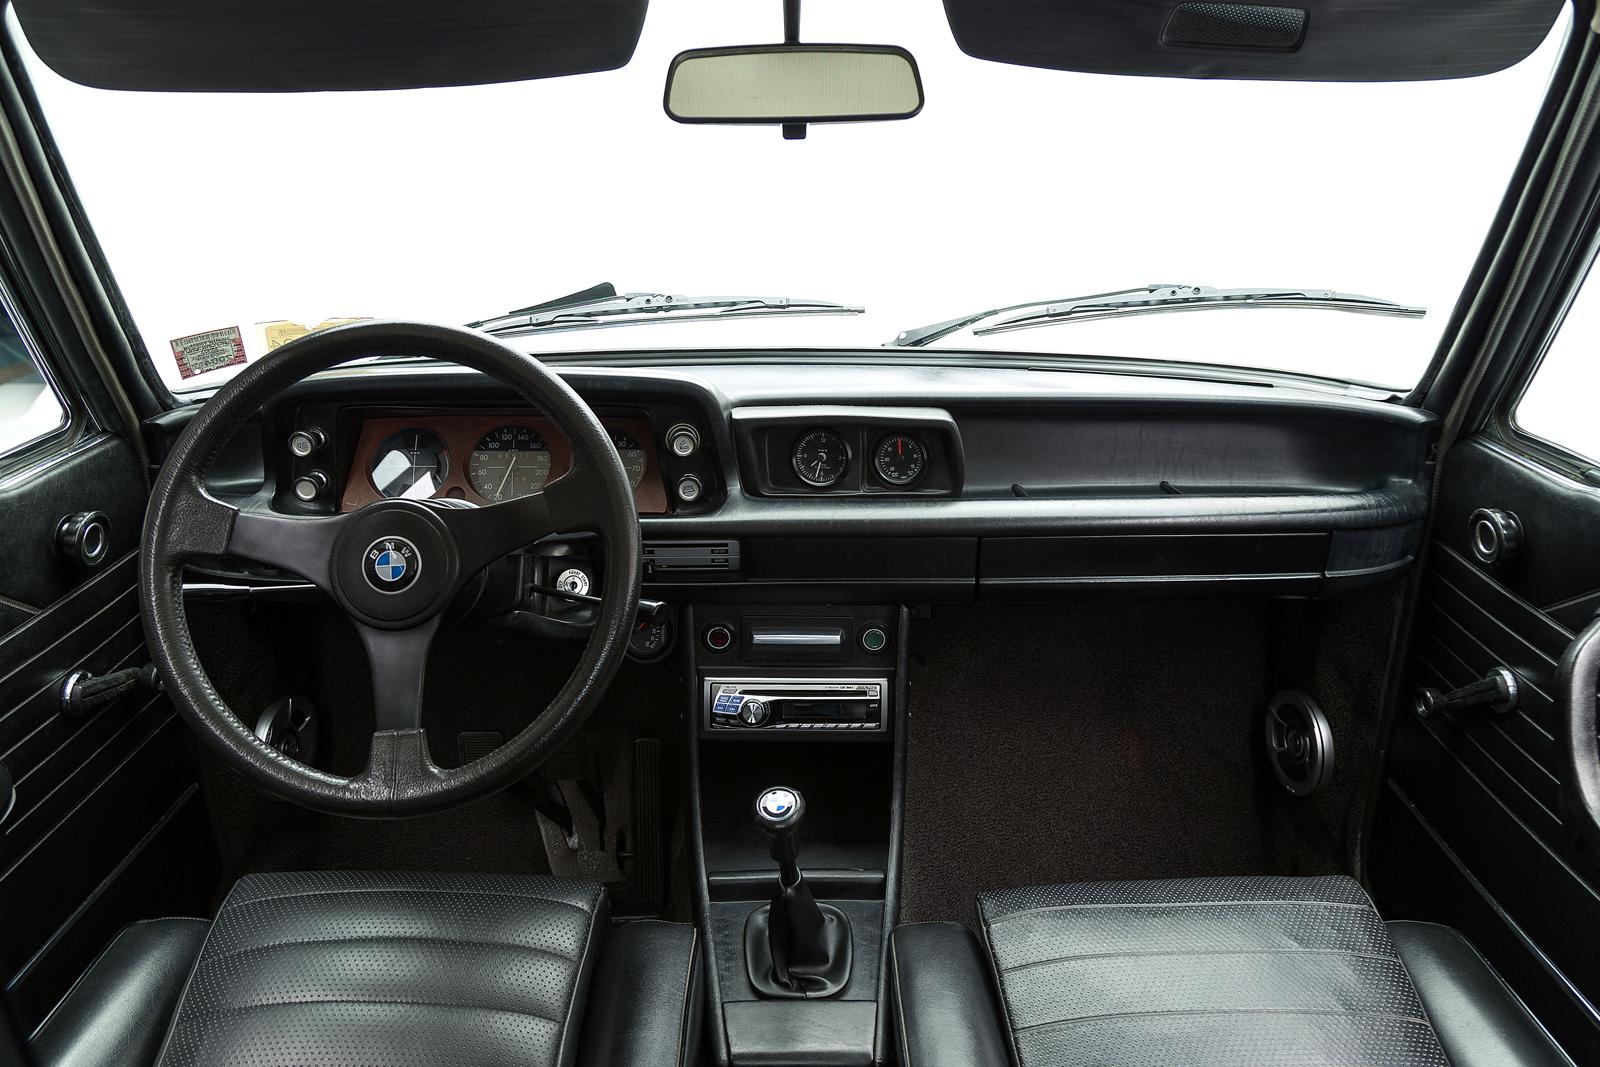 ClassicDotCom_BMW_2002_Turbo_17.jpg